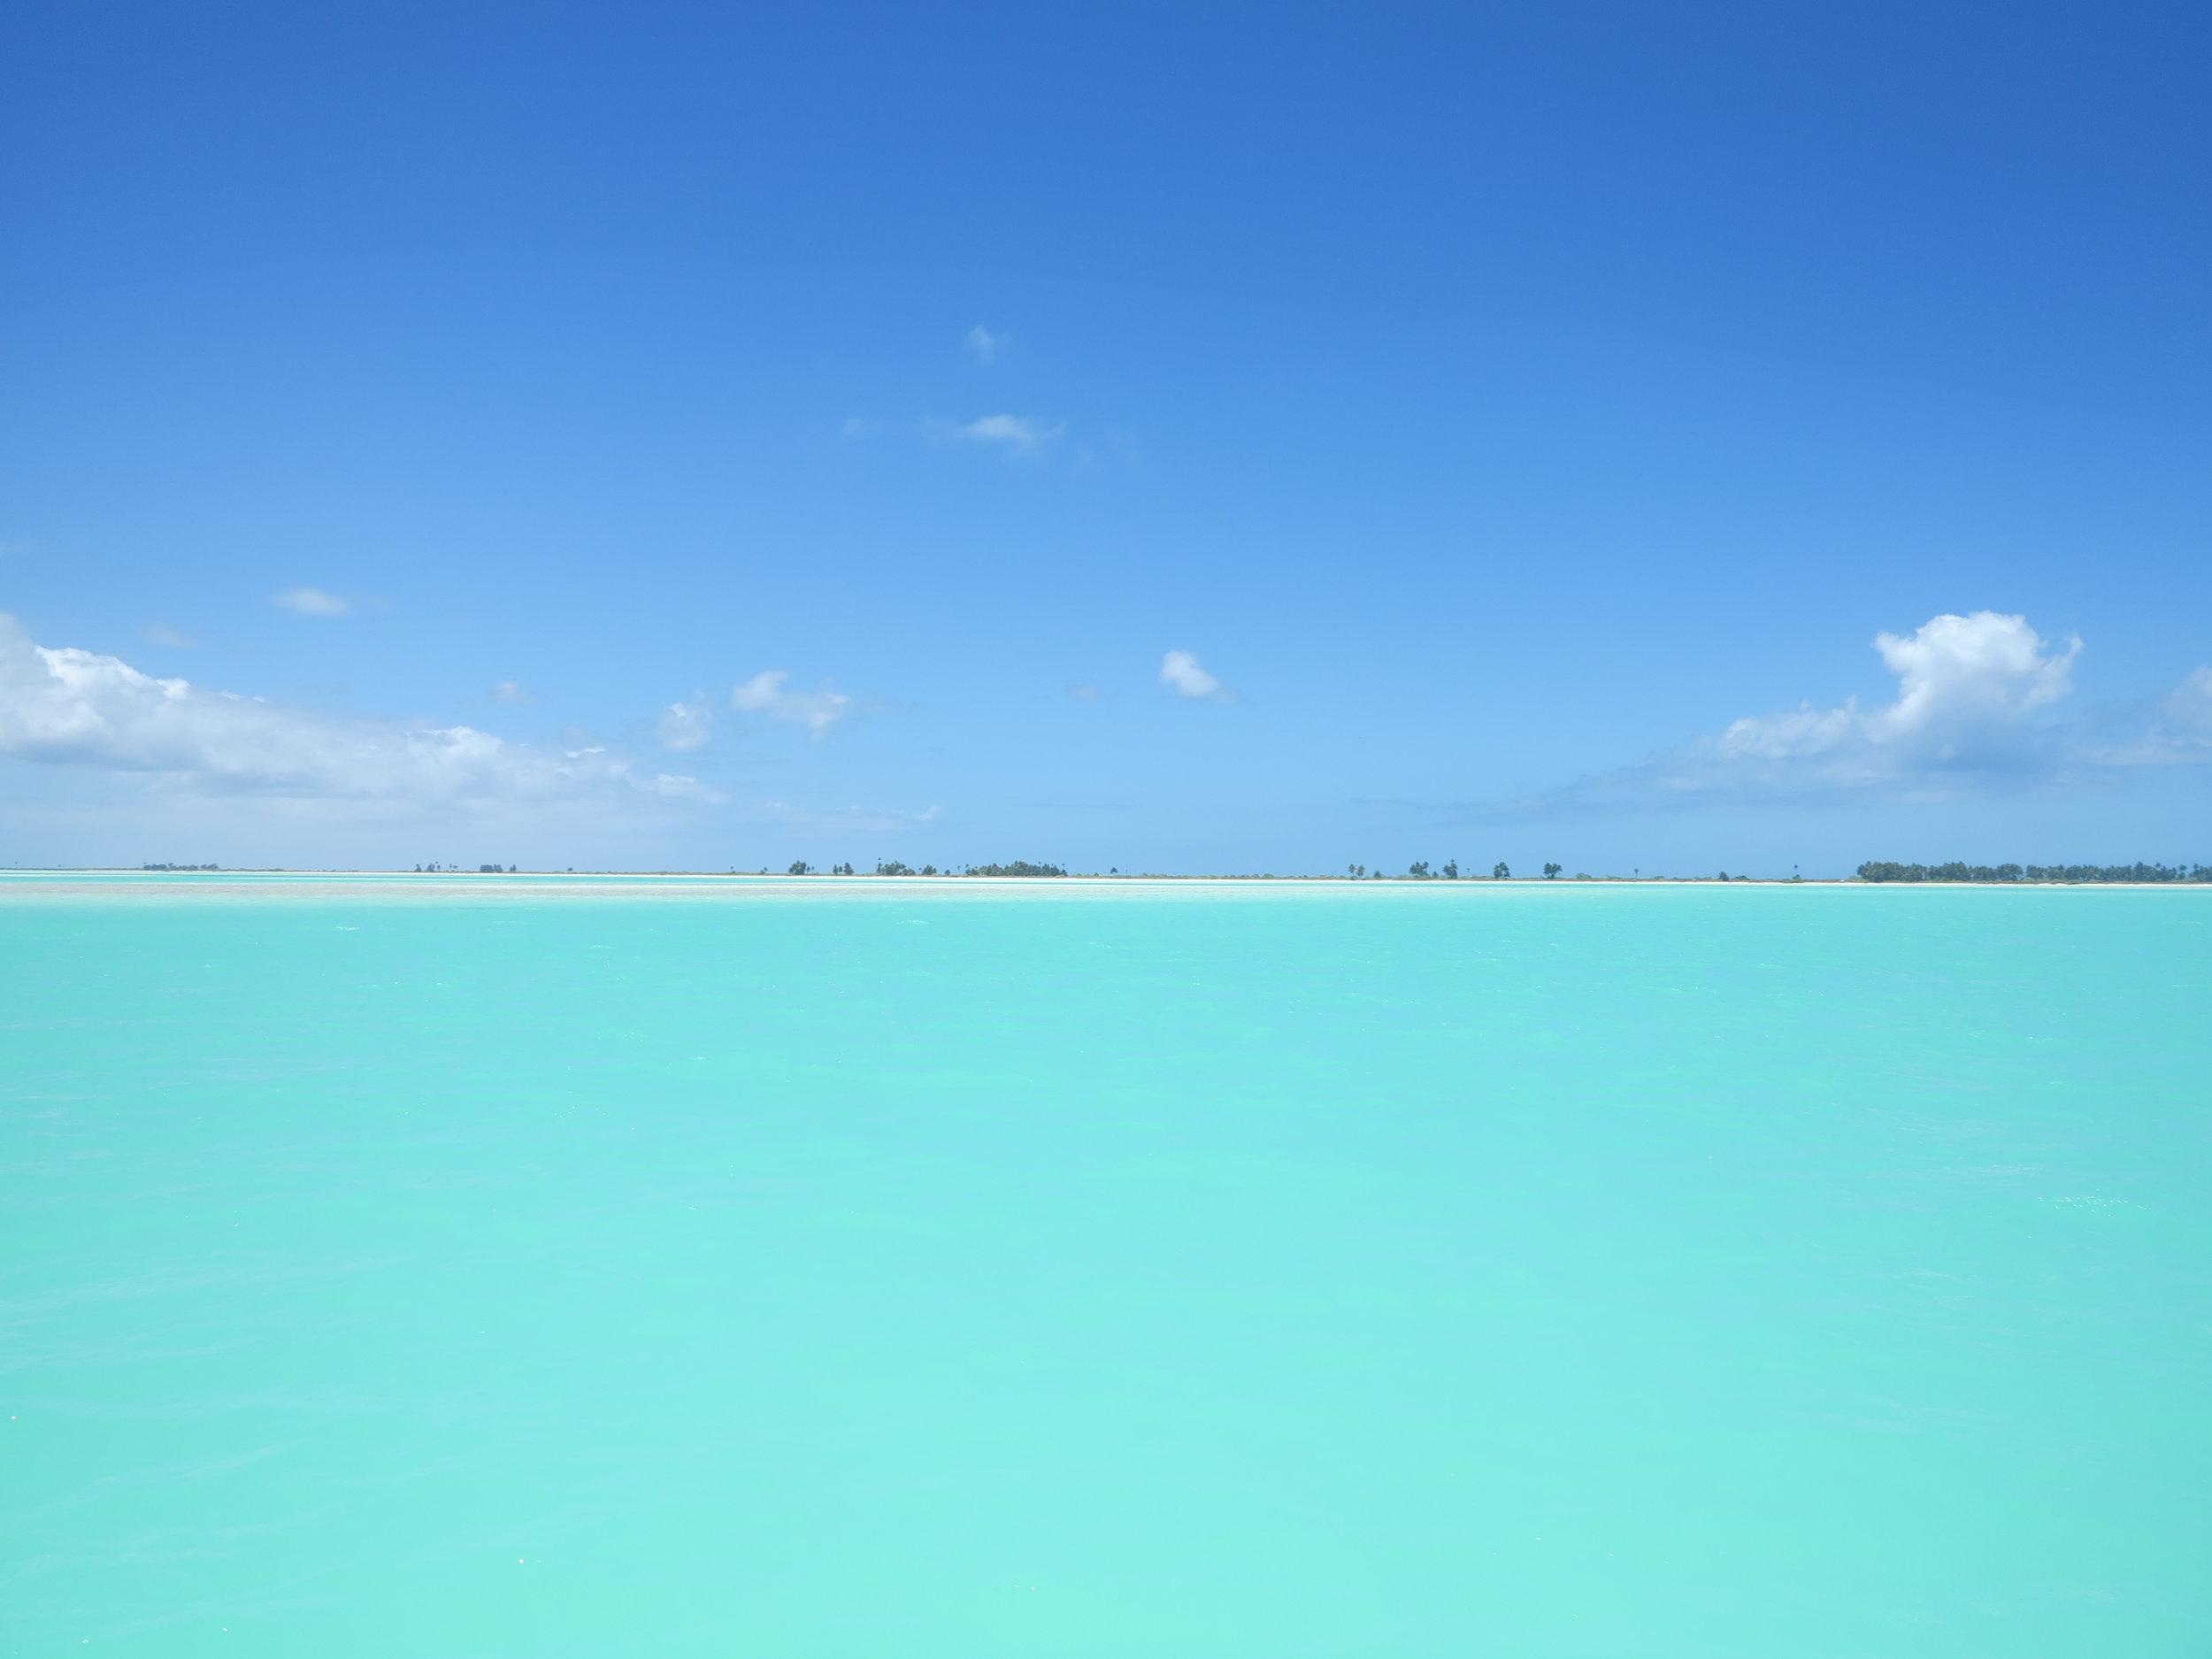 Lagoon Dreaming